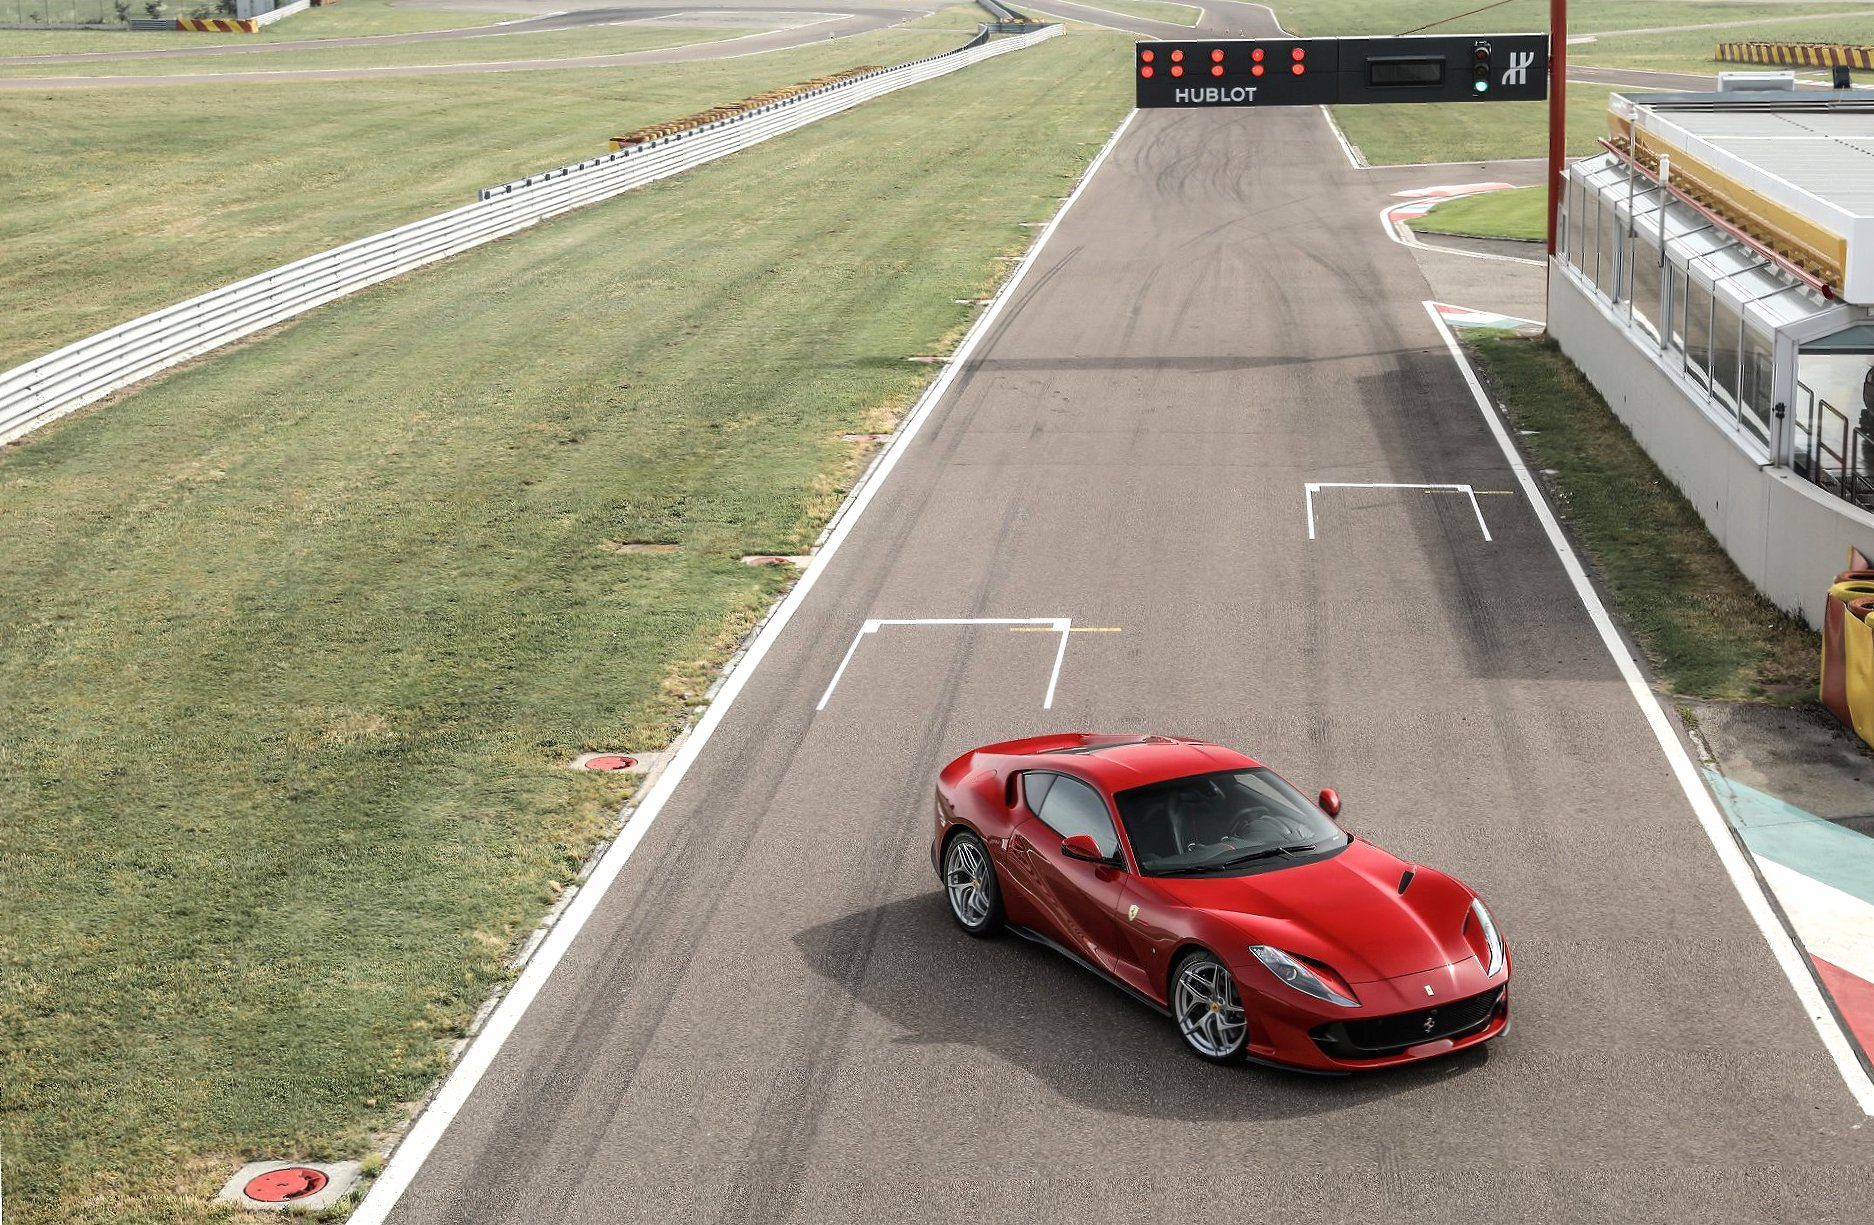 Ferrari 812 Superfast wallpapers HD quality